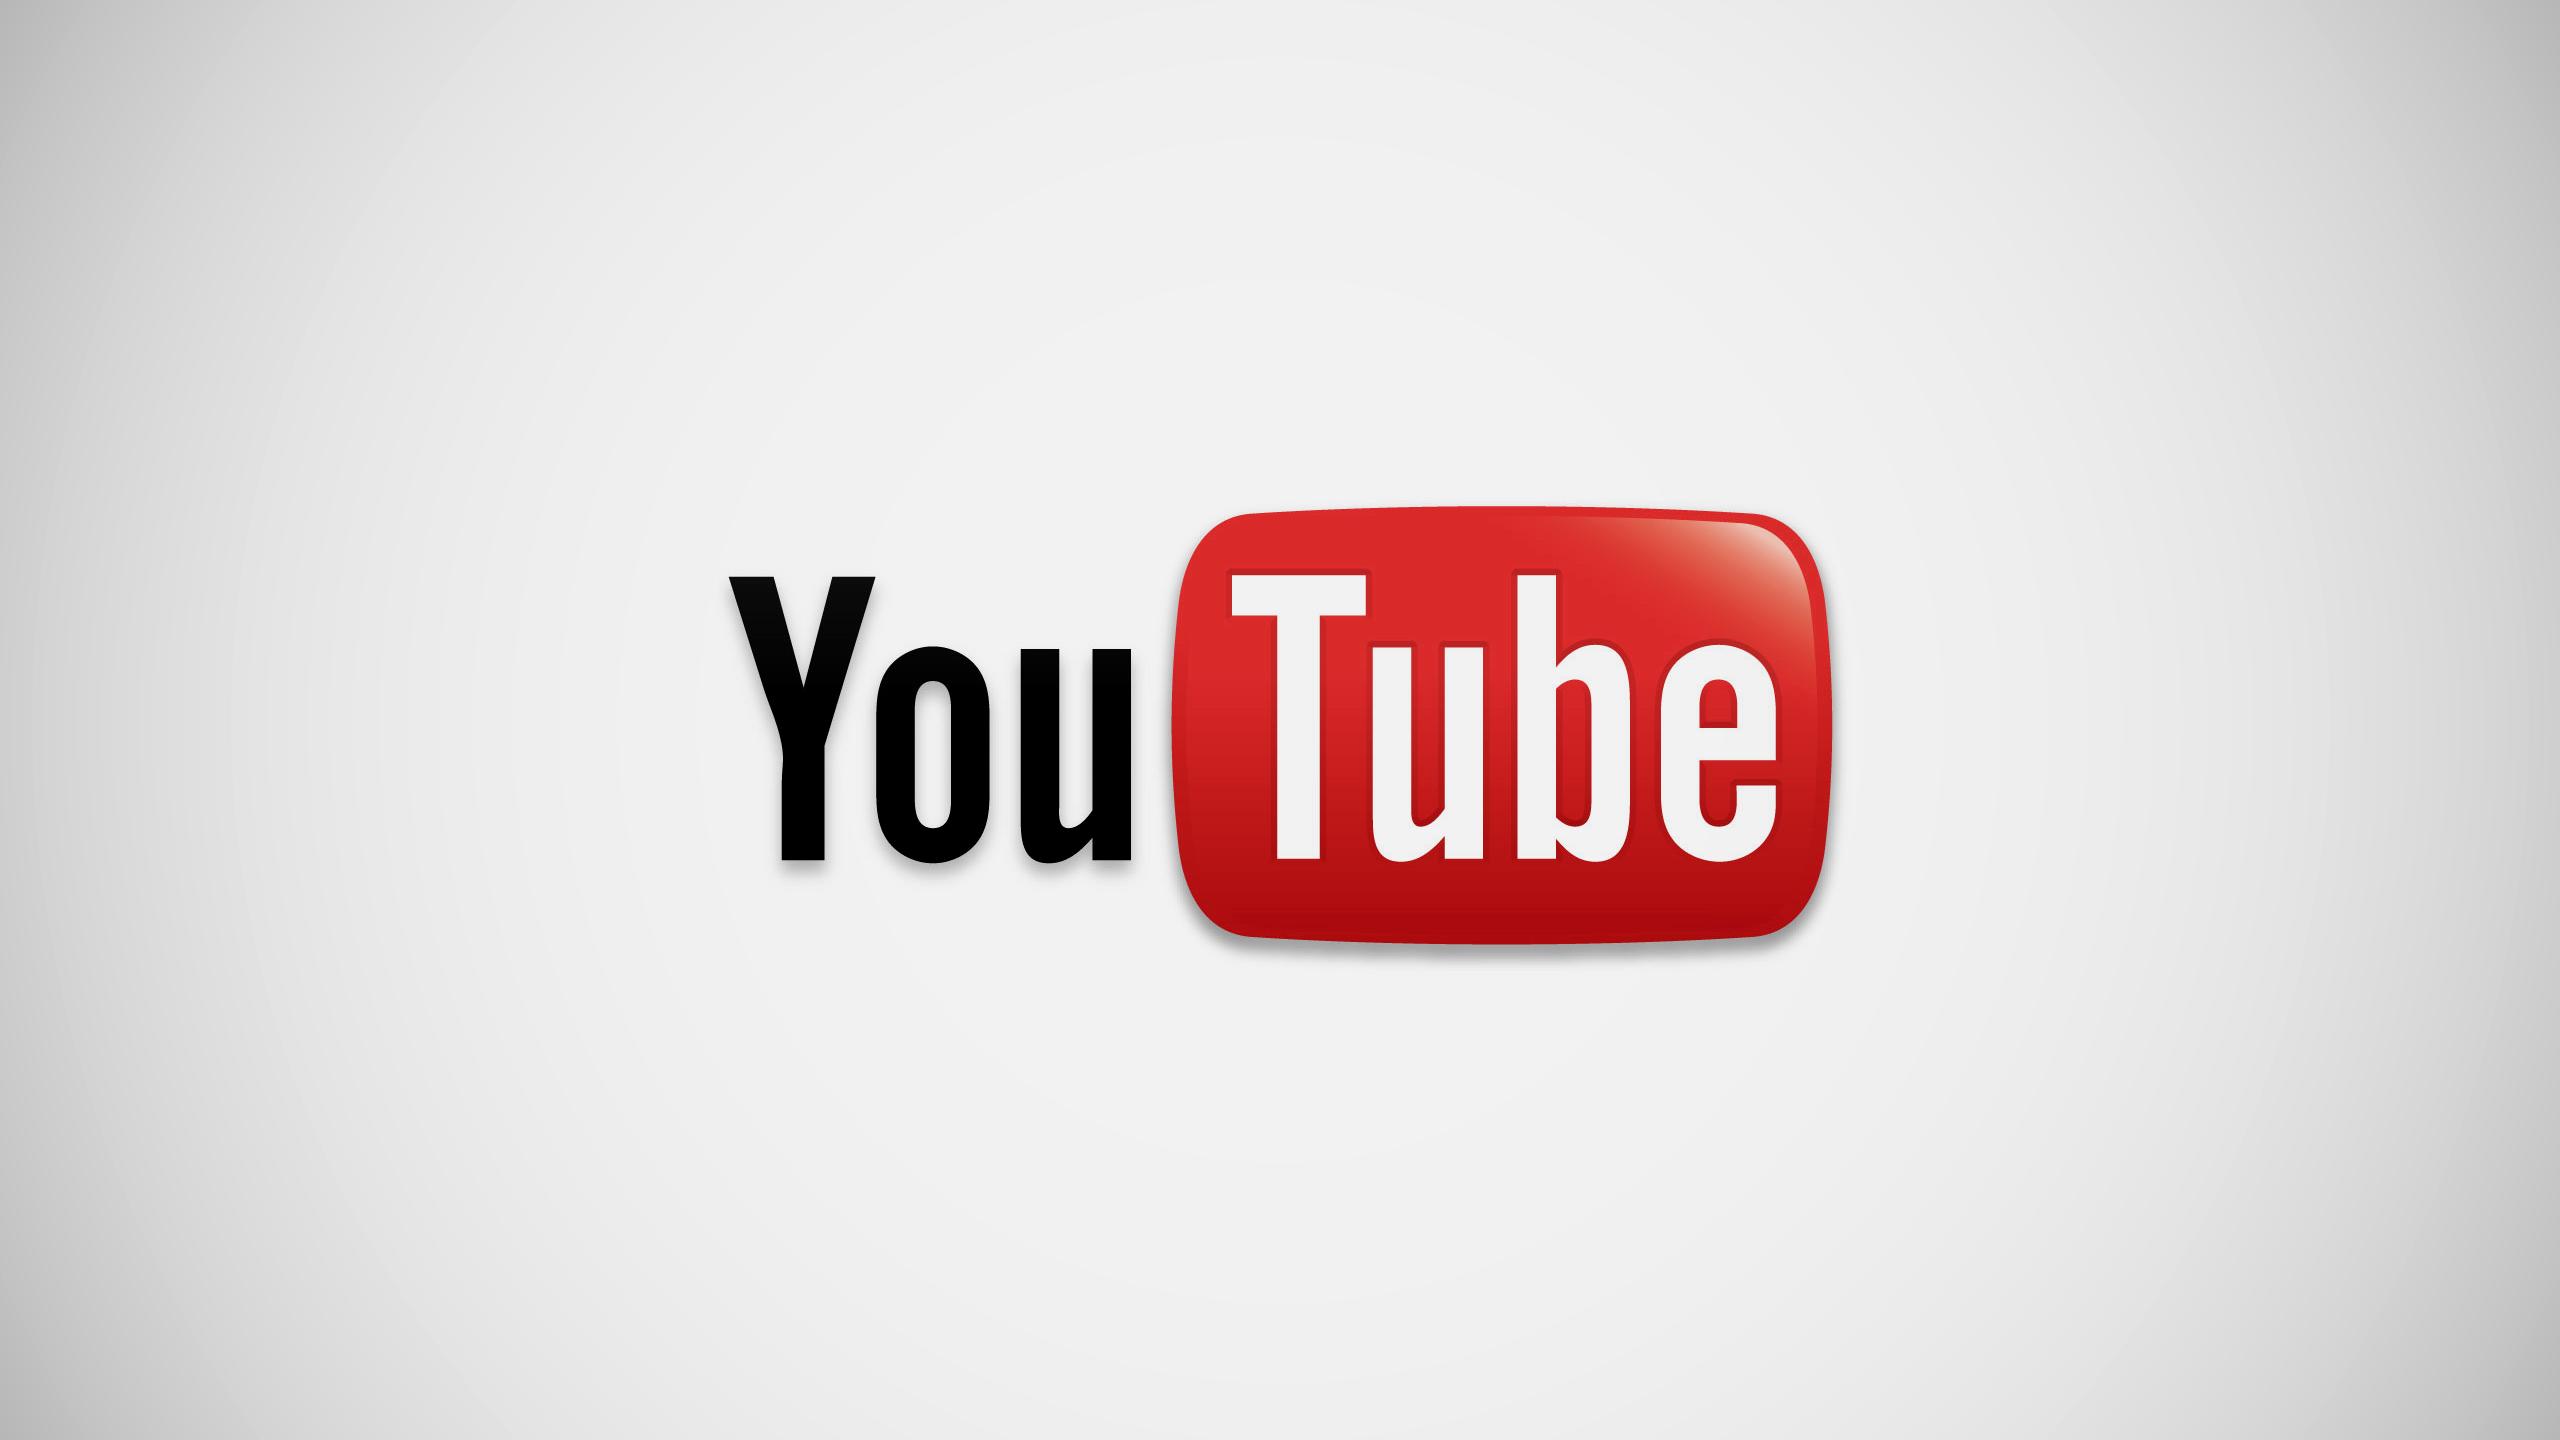 Youtube Wallpaper HD 2560x1440 by SawyerTHEBEST 2560x1440